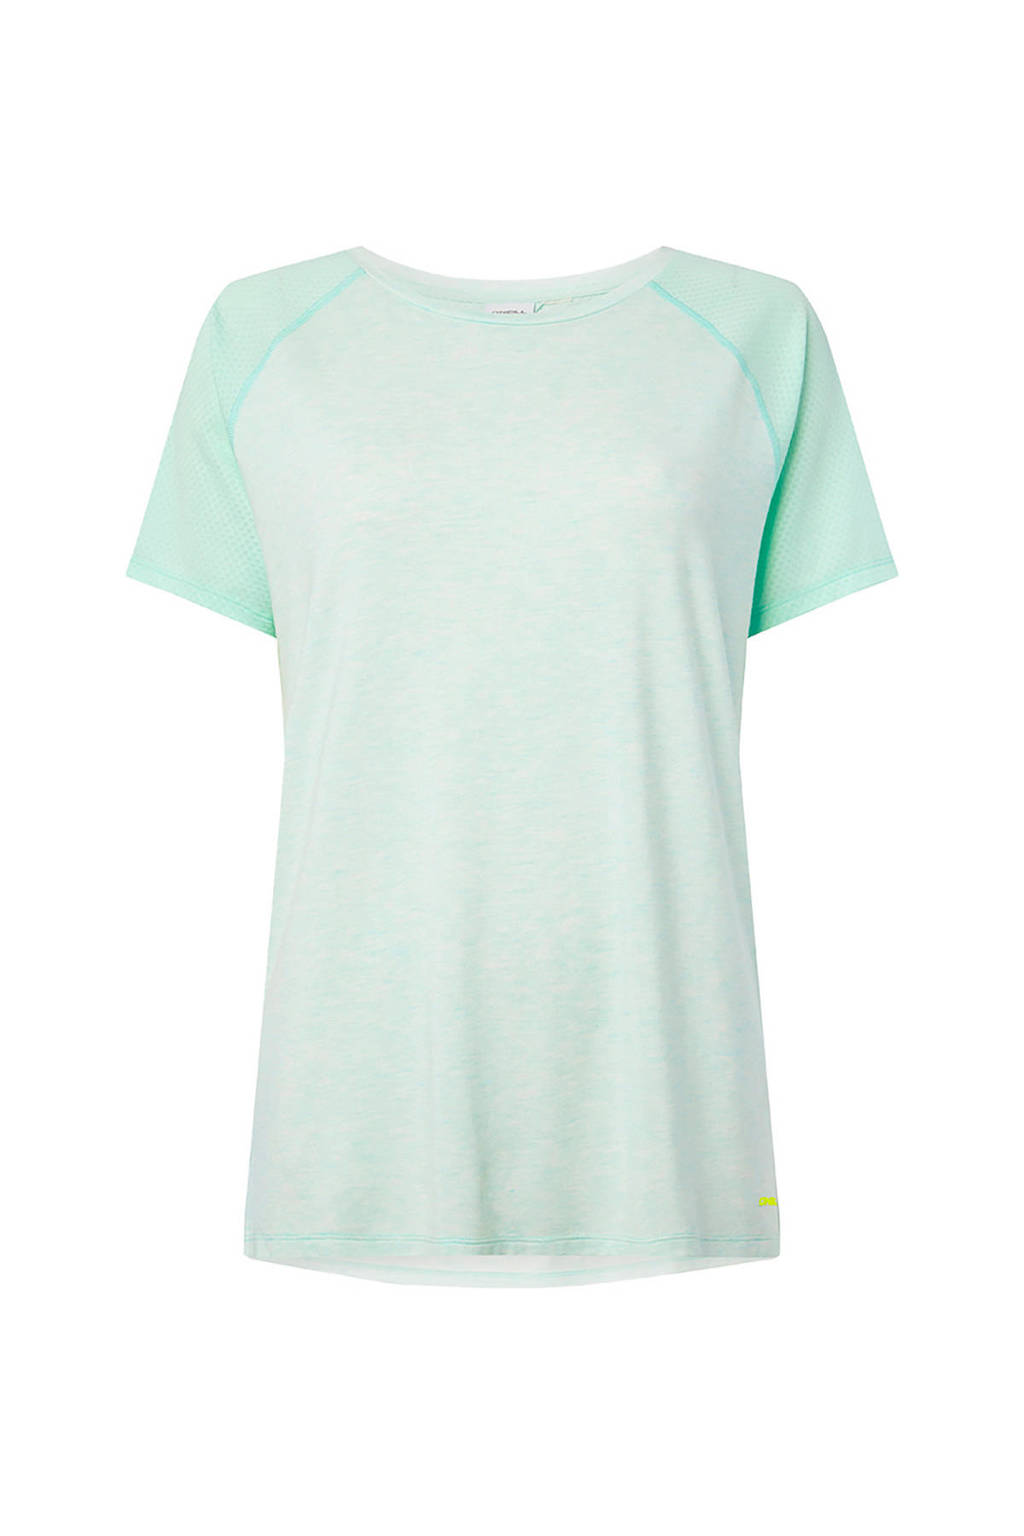 WE Fashion sport T-shirt, Waterfall